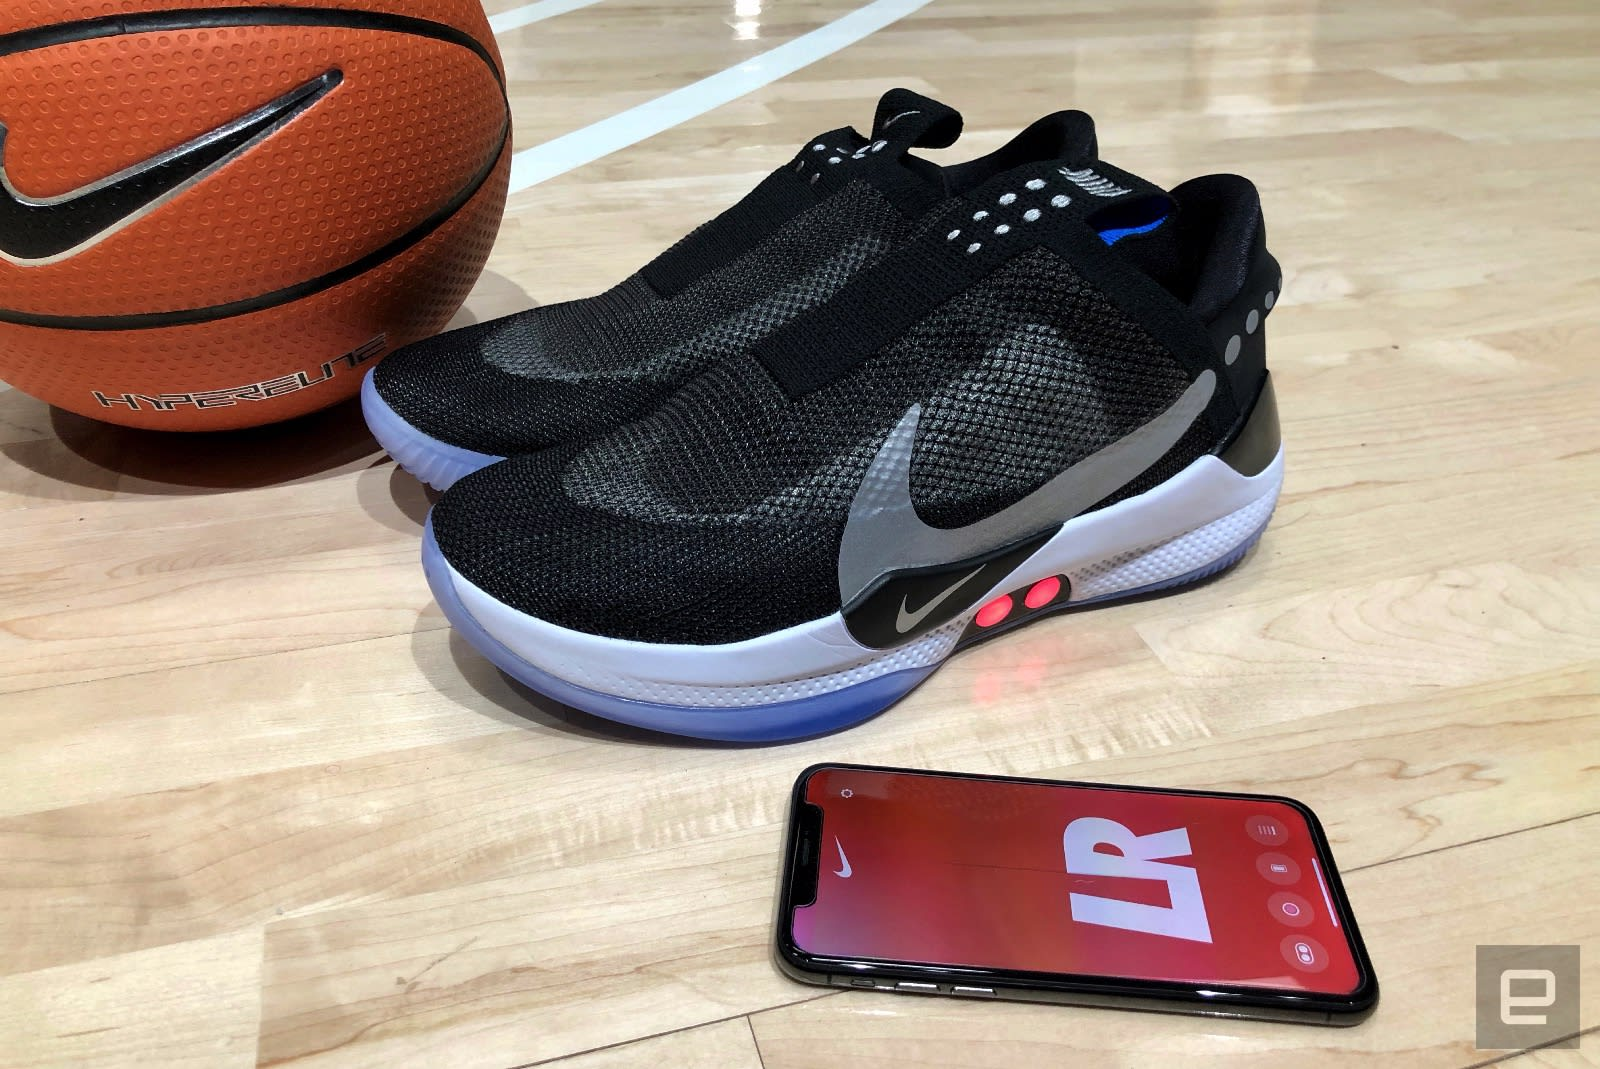 Nike's Adapt BB